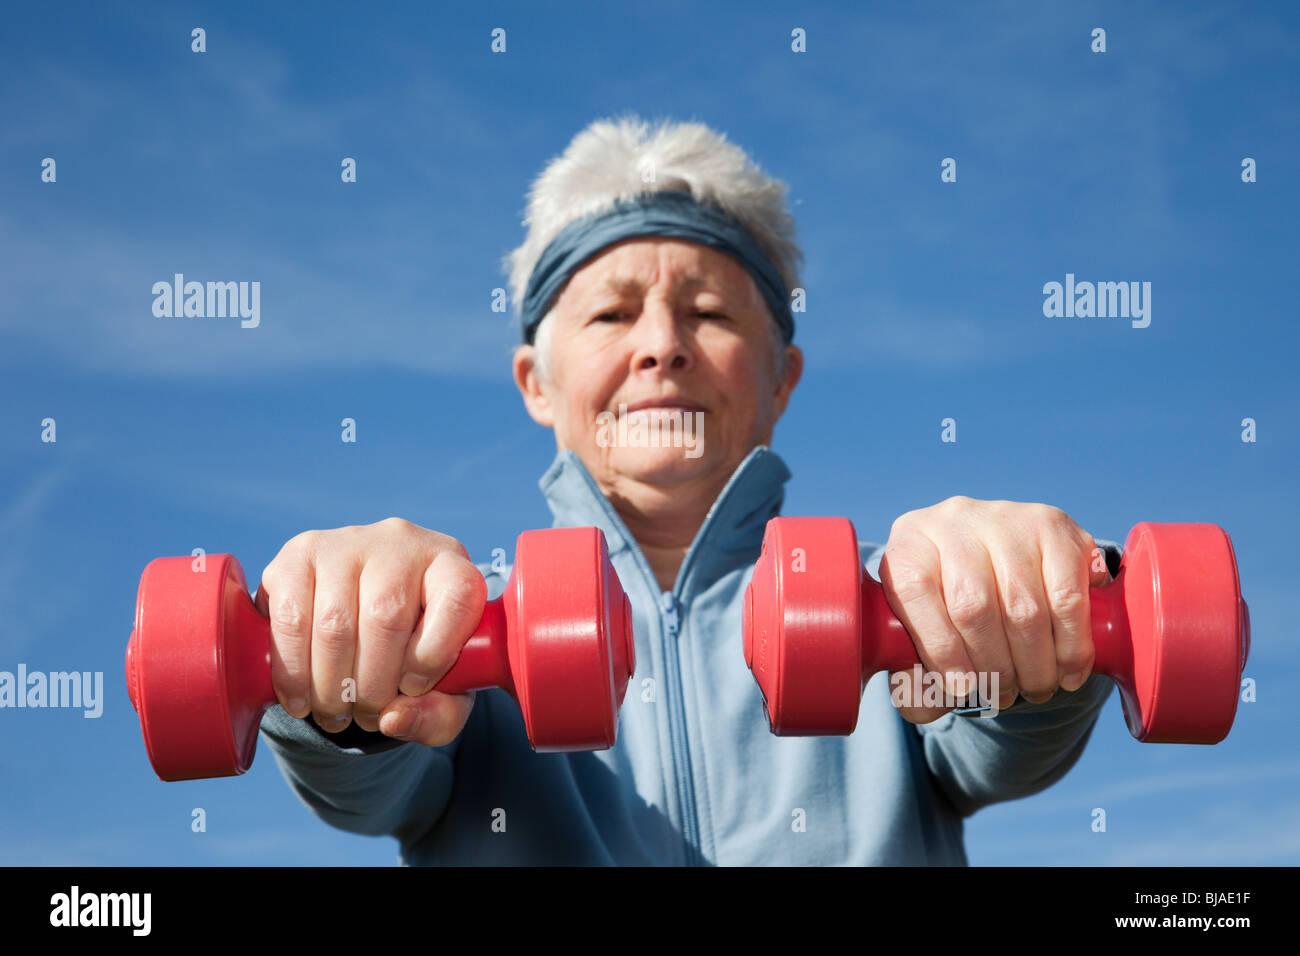 Active Senior Frau Trainieren mit hantel Trainingshanteln Training im Freien fit zu halten. Gesunder Lebensstil Stockbild